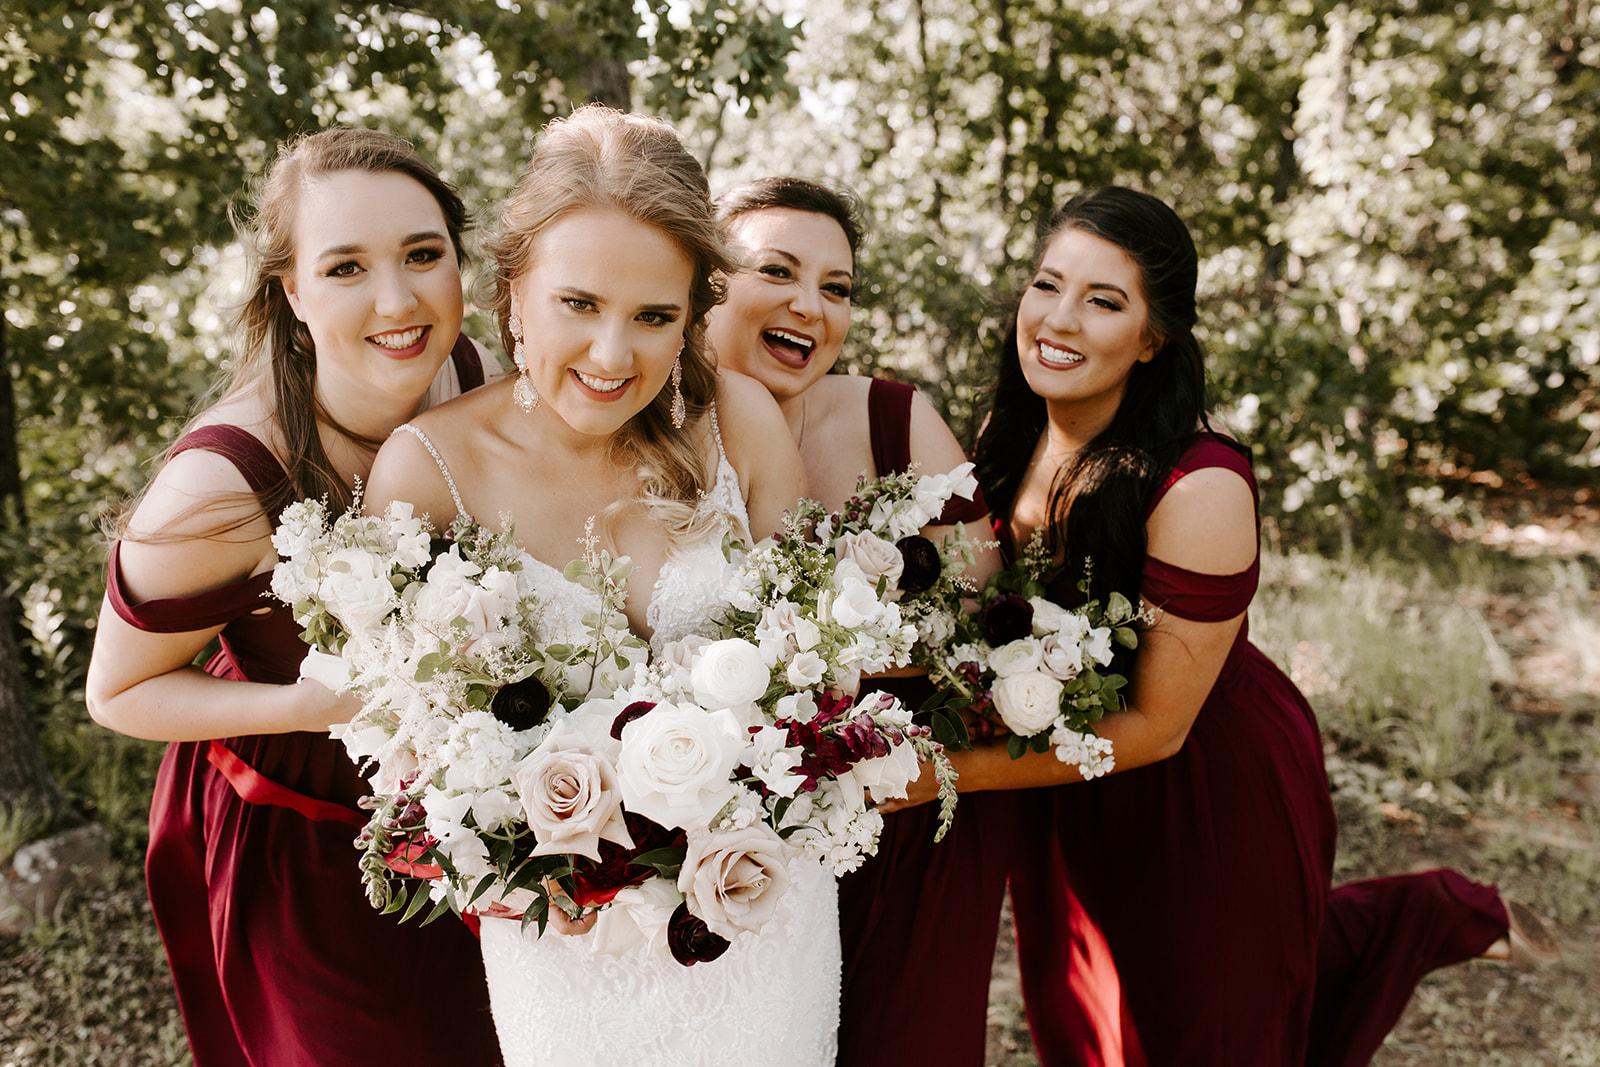 Wedding Venues in Tulsa white barn Dream Point Ranch 25.jpg